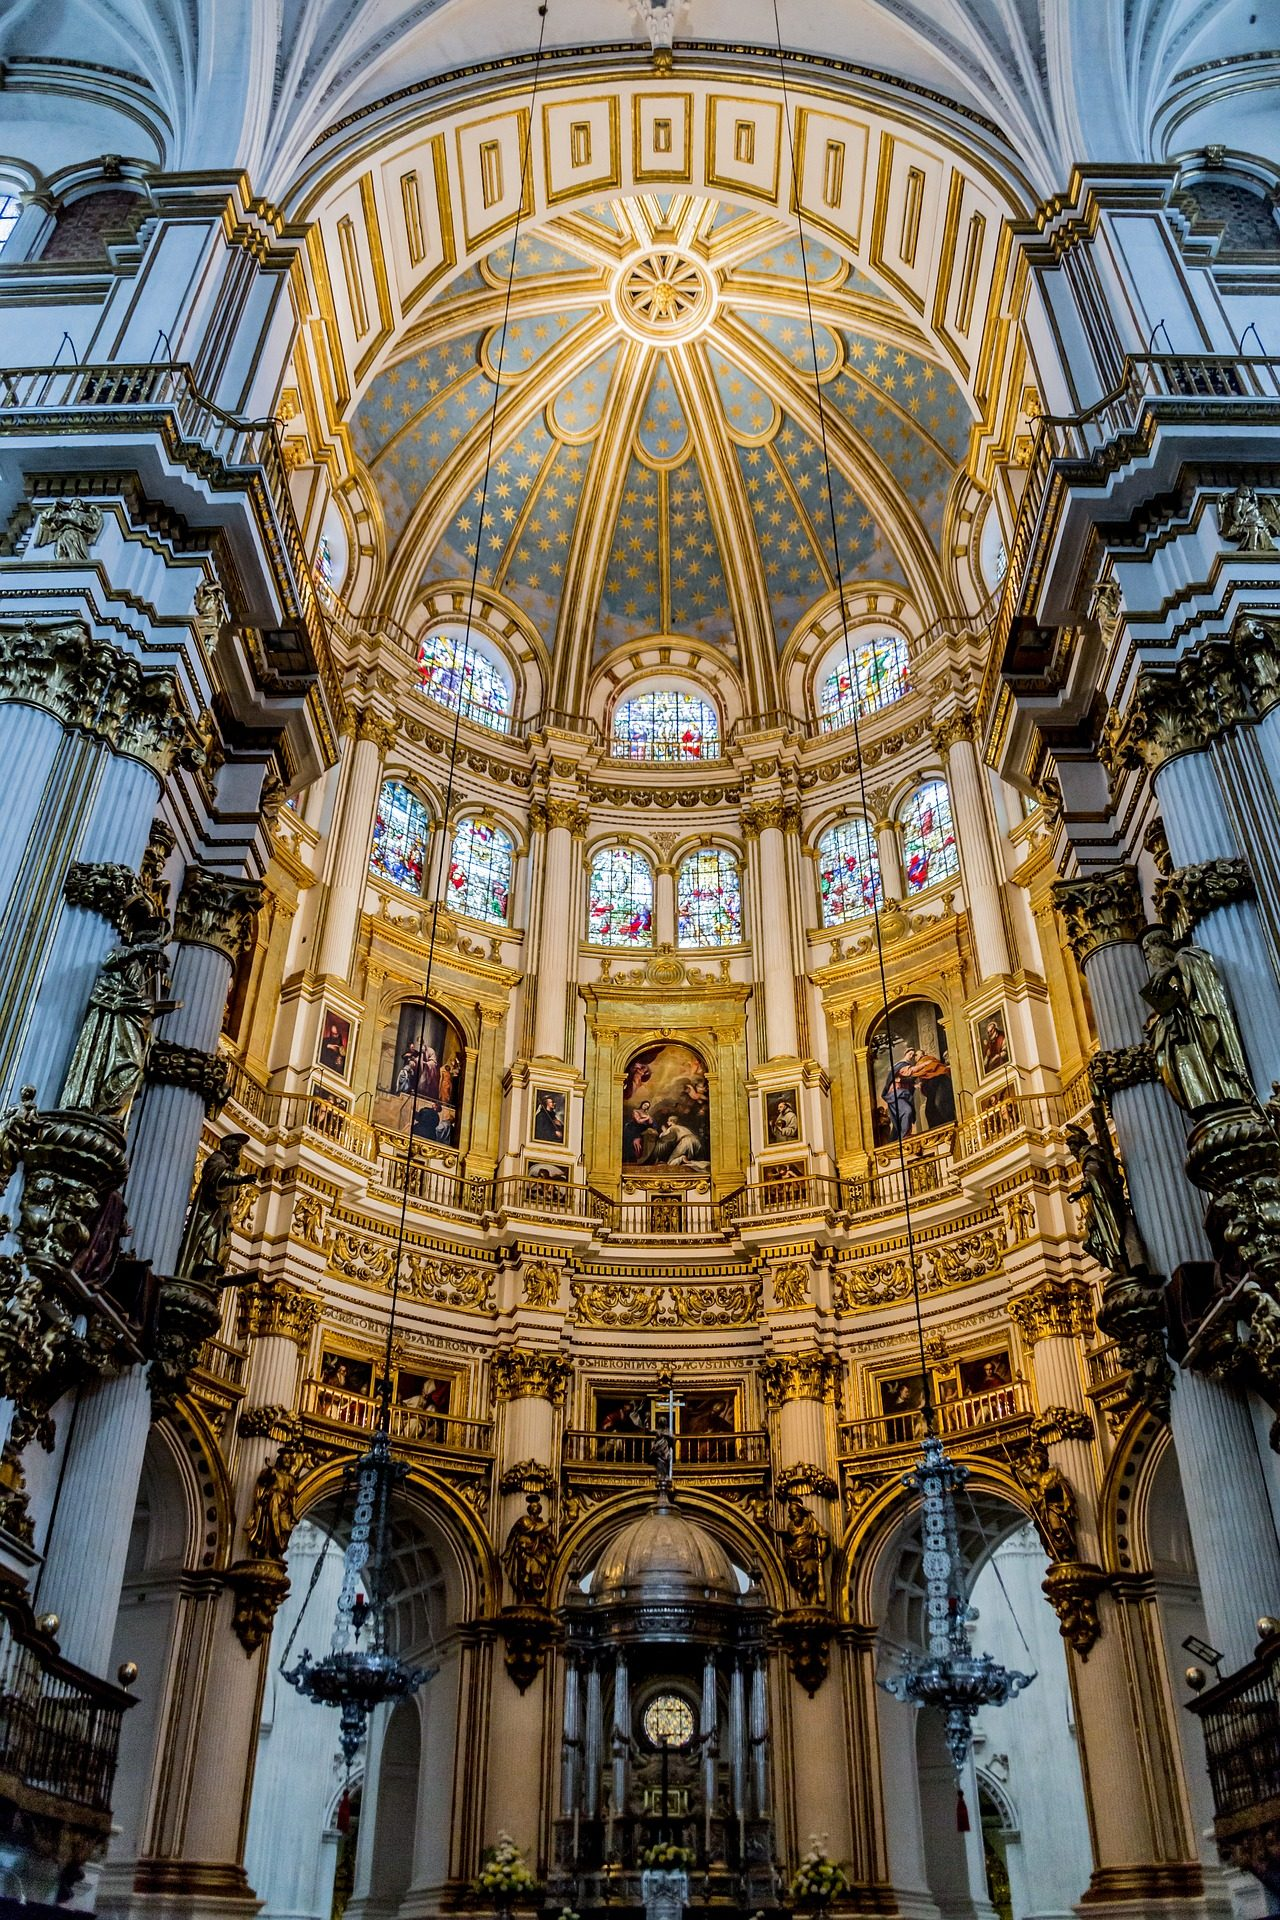 iglesia, templo, bóveda, catedral, ornamentación, granada - Fondos de Pantalla HD - professor-falken.com